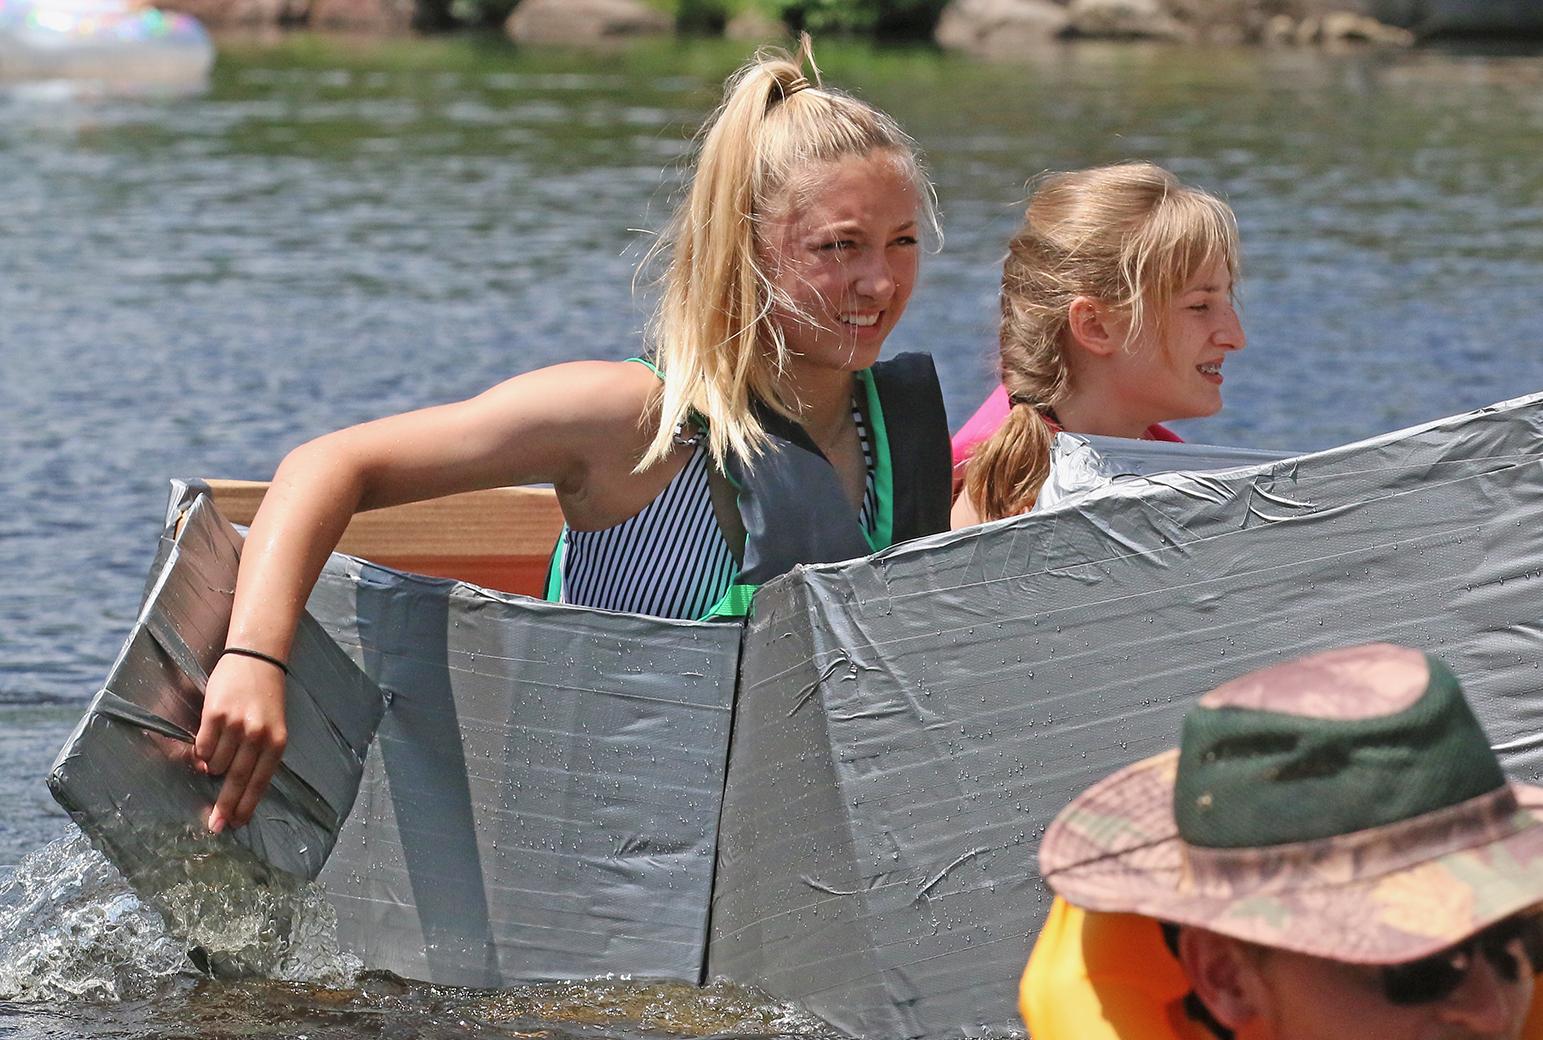 Paige Danen, left, and Sami Danen came in second in the cardboard regatta at Tilleda Falls — a small, private campground near Gresham.Carol Ryczek | NEW Media